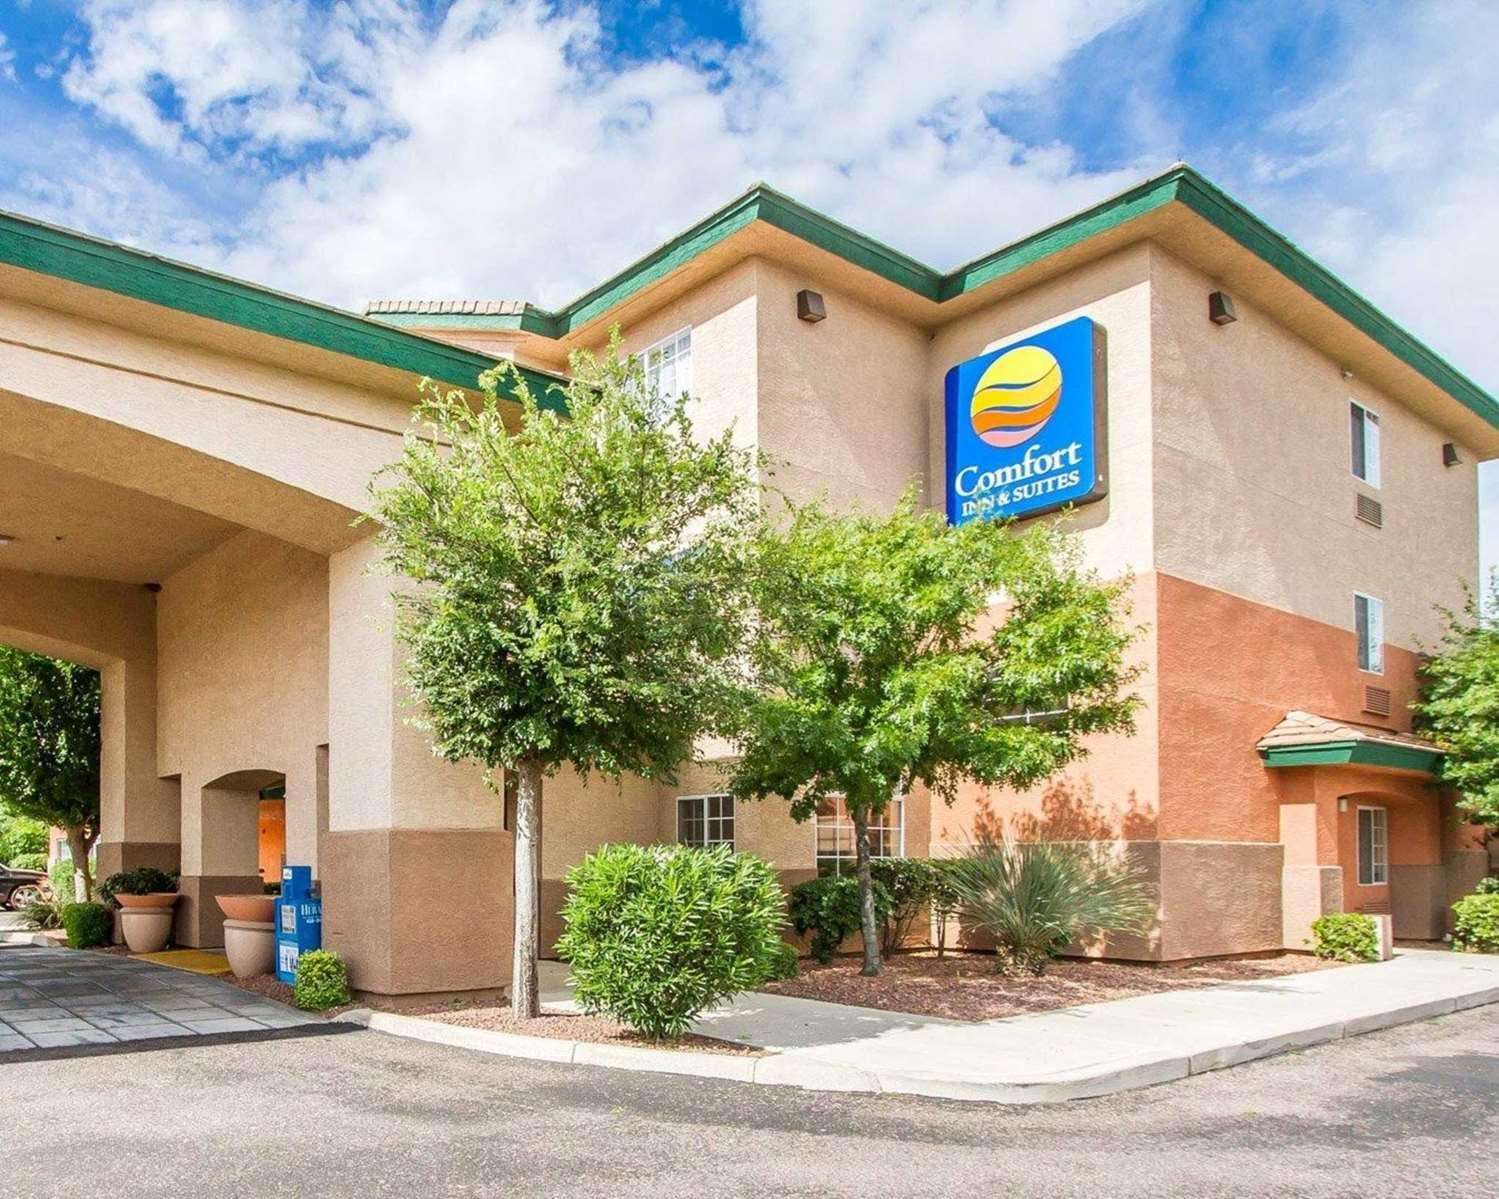 Comfort Inn & Suites hotel in Sierra Vista, AZ